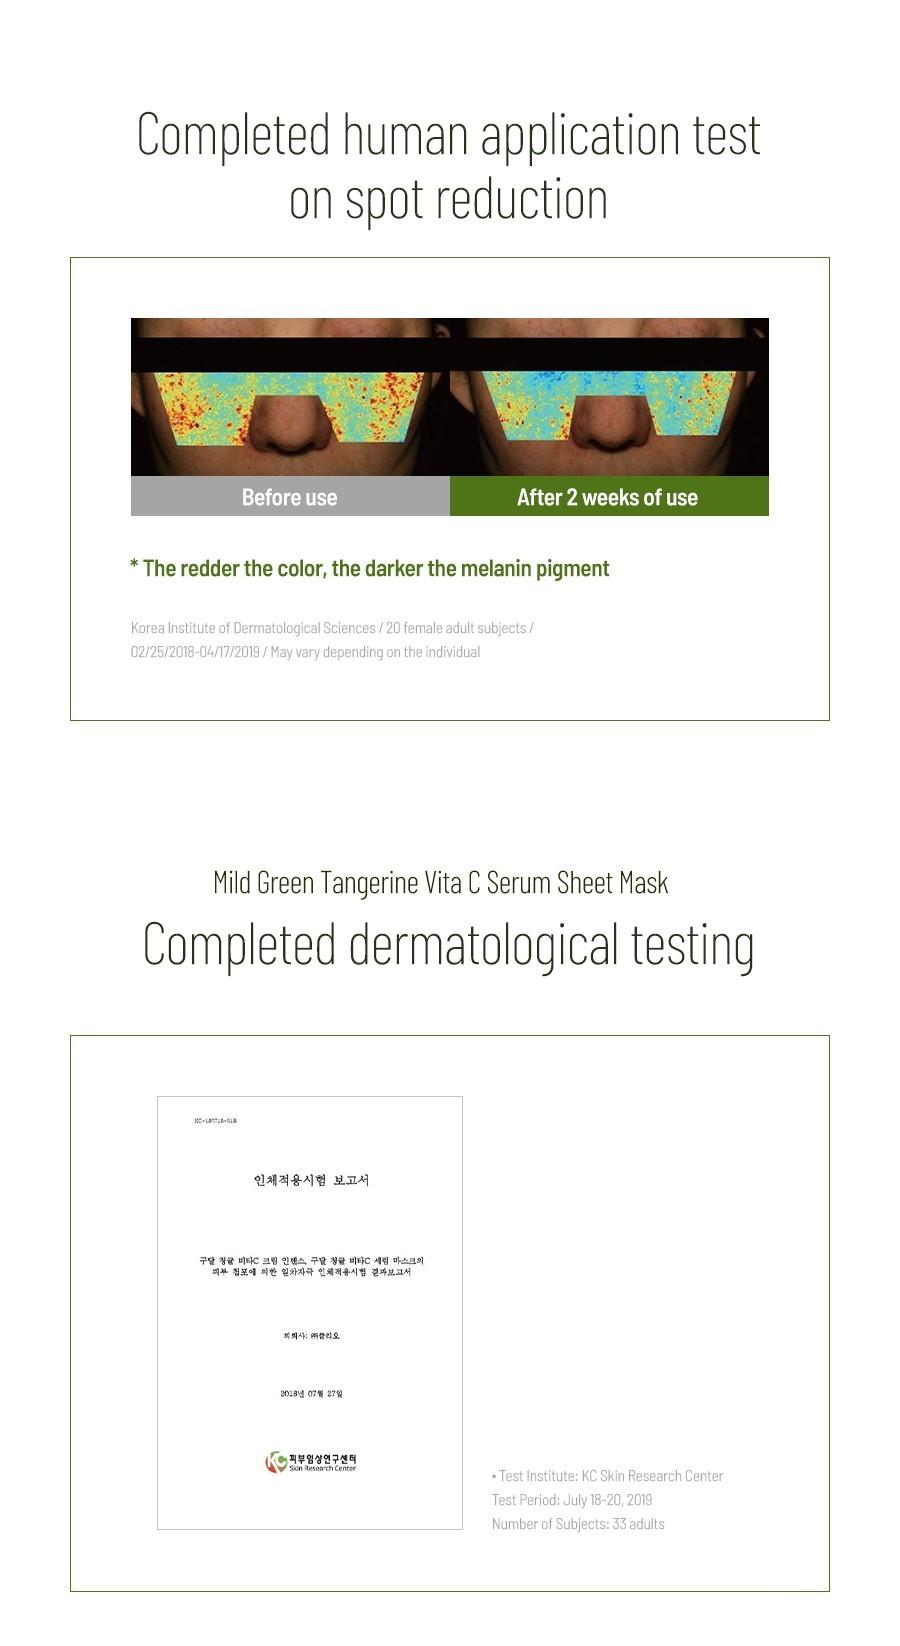 Green Tangerine Vita C Dark Spot Serum Sheet Mask-6